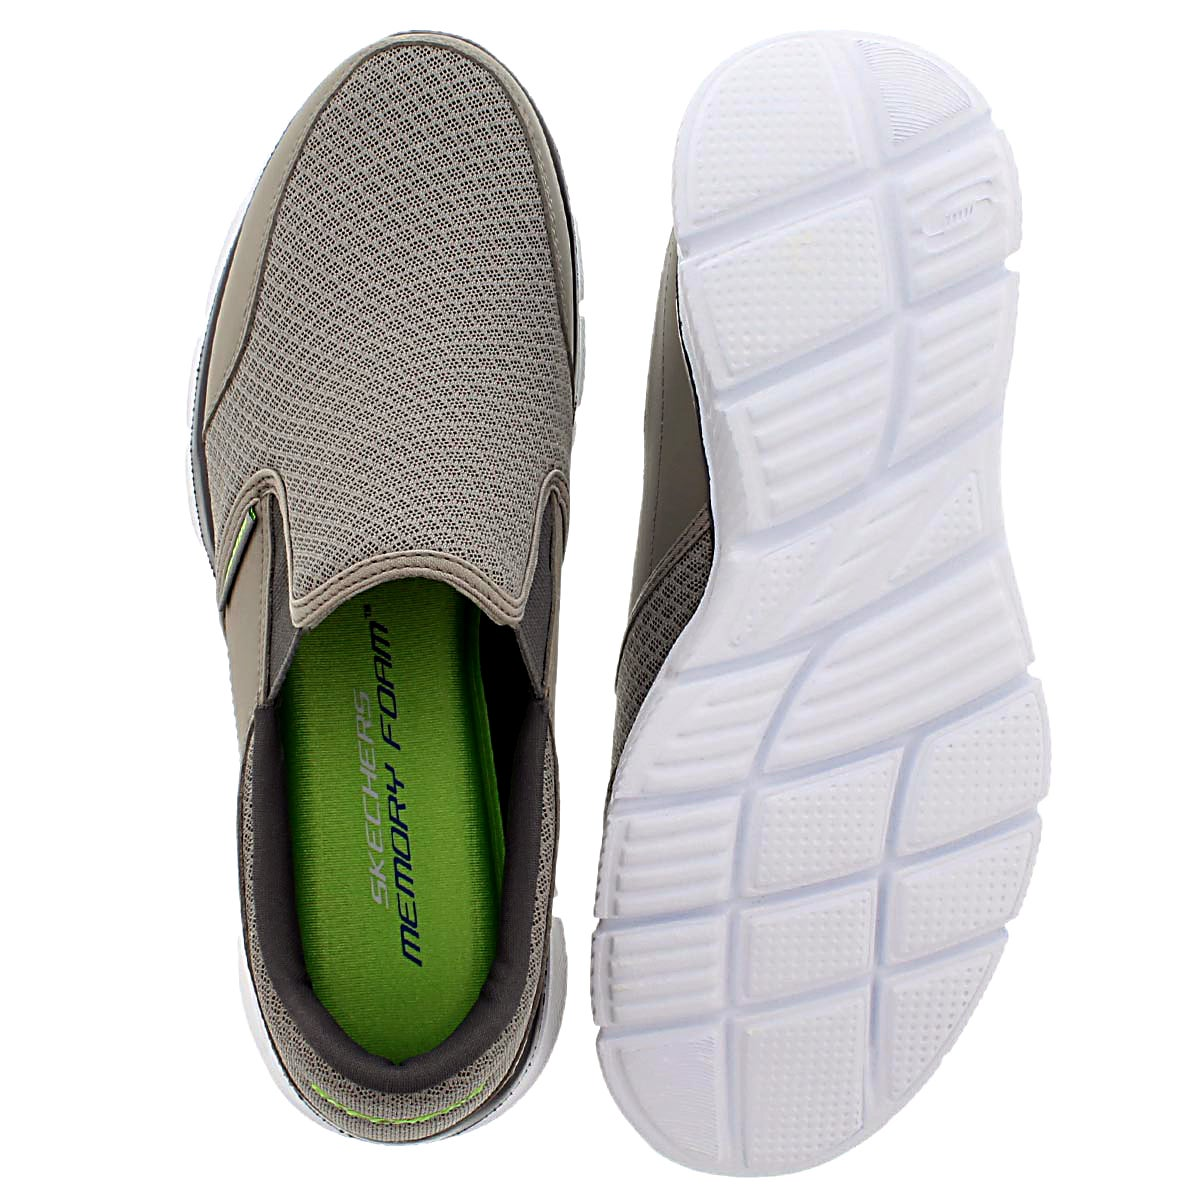 Mns Persistent grey slip on sneaker